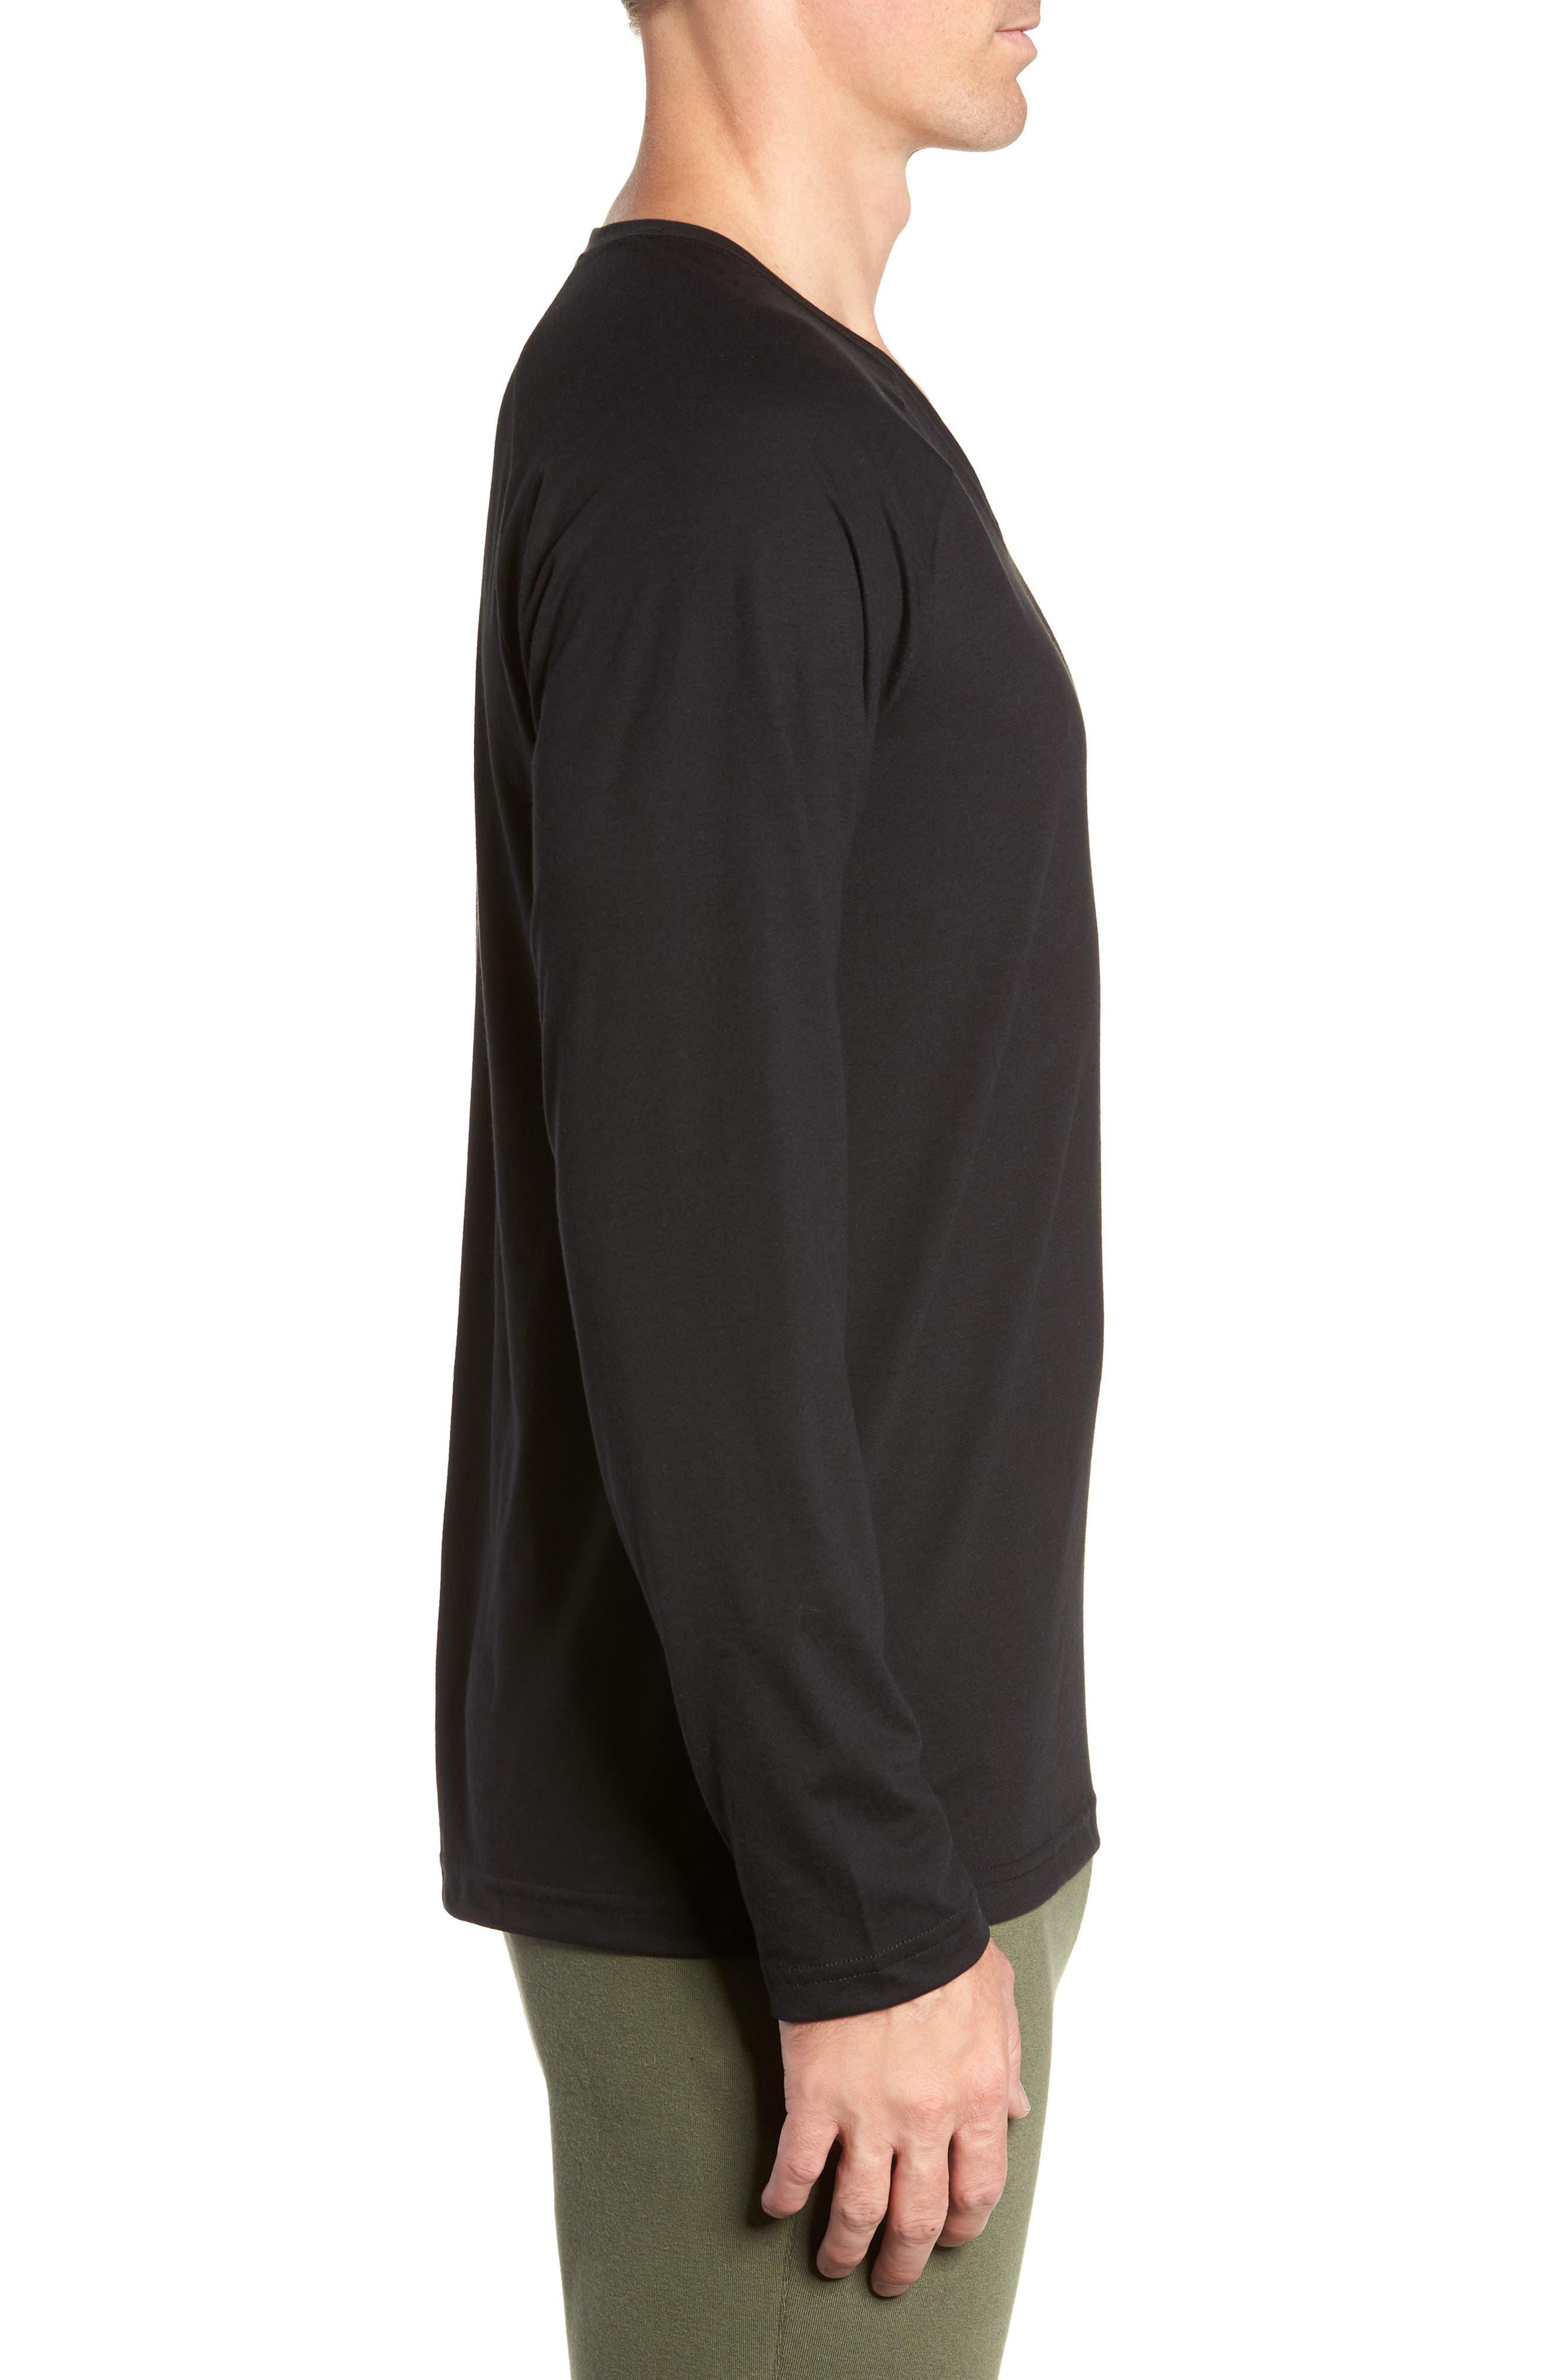 ALO, Triumph Long Raglan Sleeve V-Neck T-Shirt, Alternate thumbnail 3, color, SOLID BLACK TRIBLEND